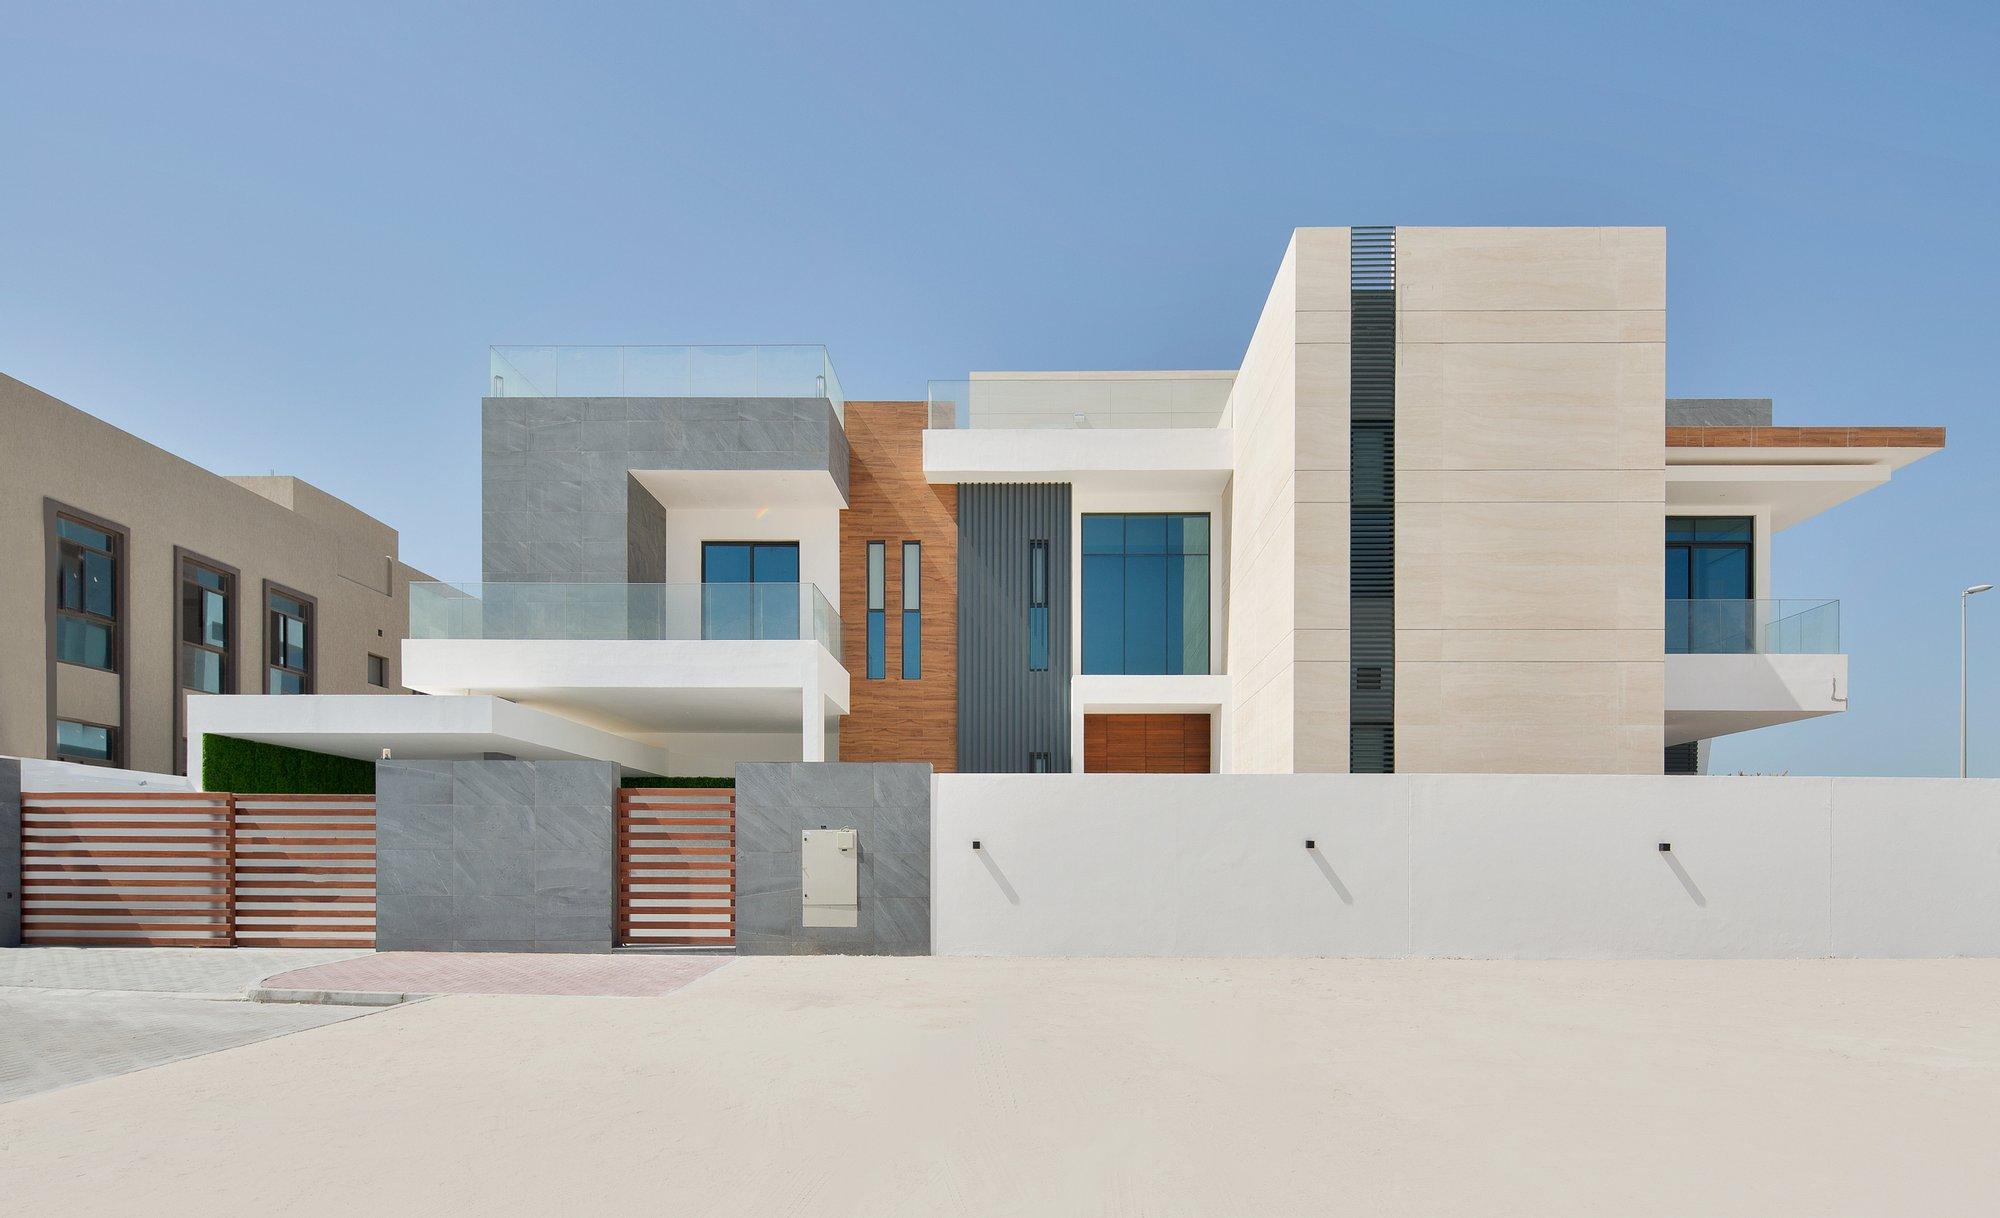 House in Jumeirah, Dubai, United Arab Emirates 1